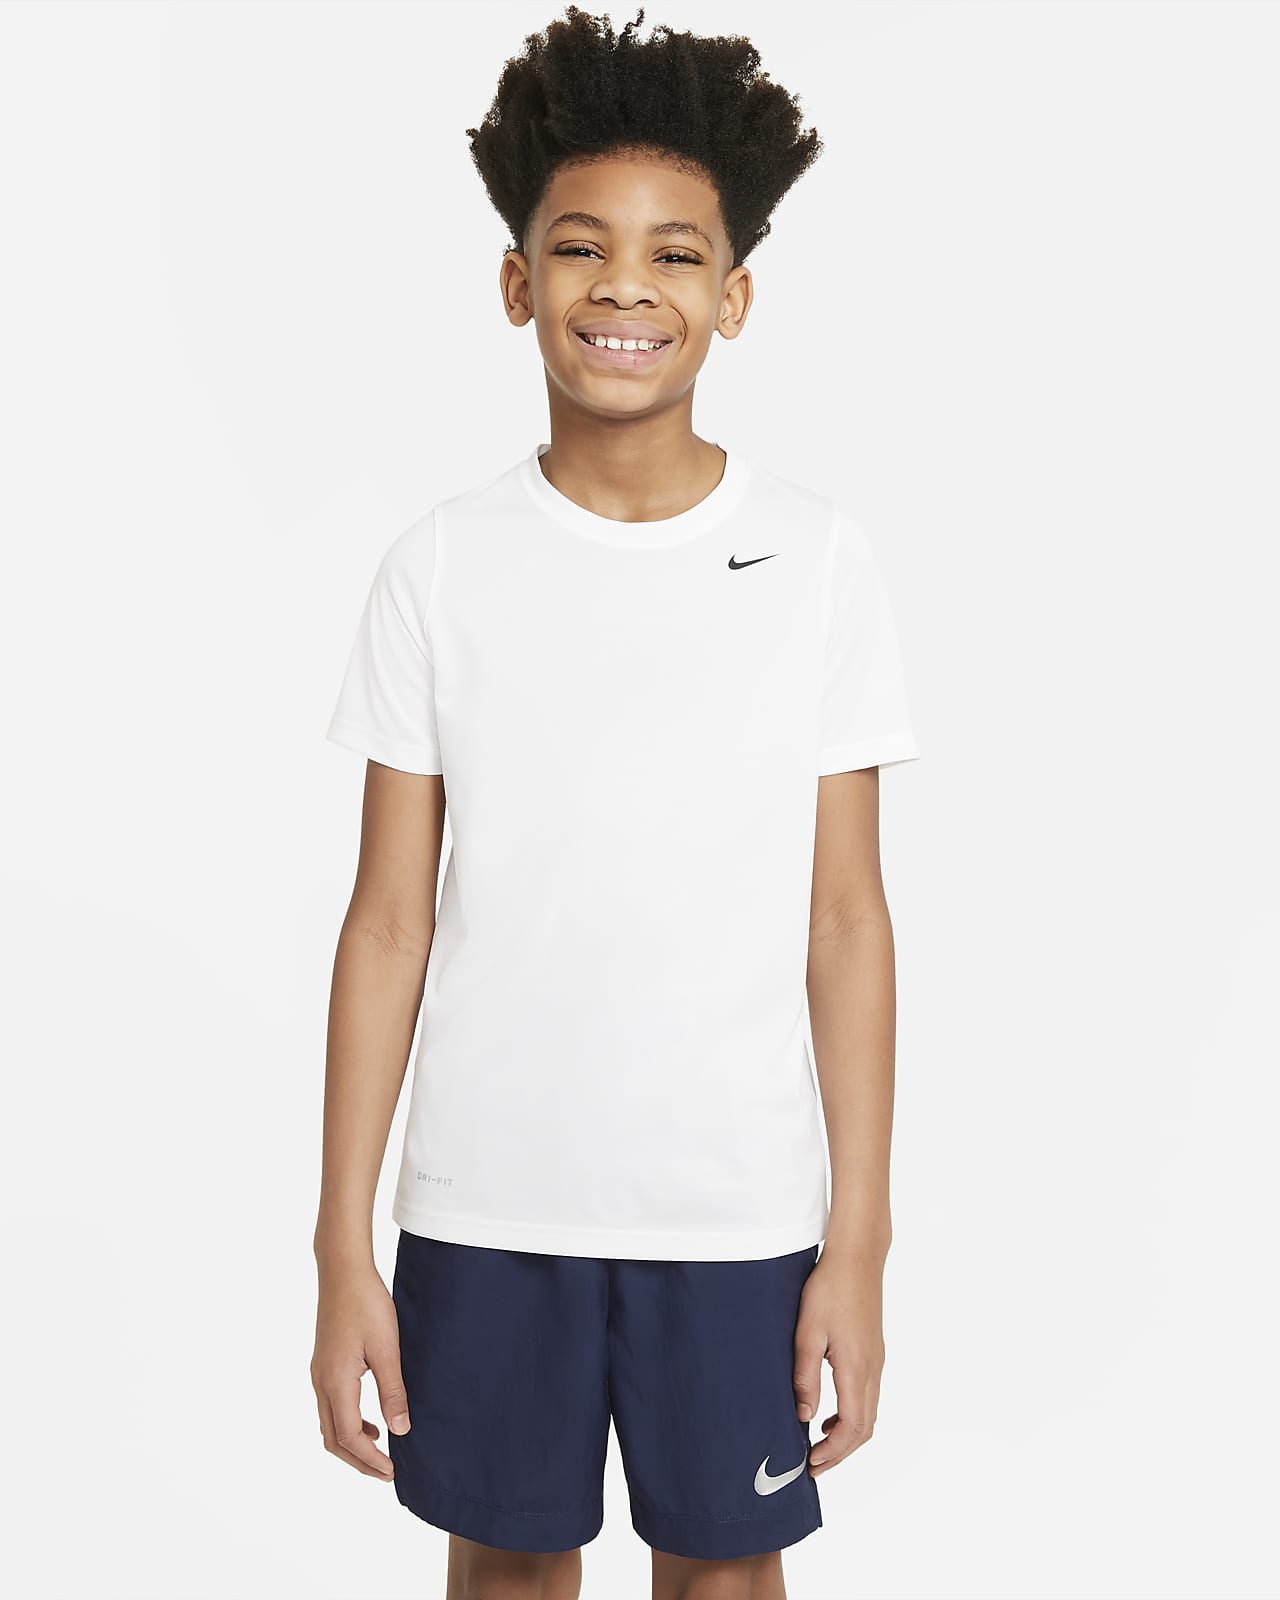 Nike Dri-FIT Older Kids' Training T-Shirt